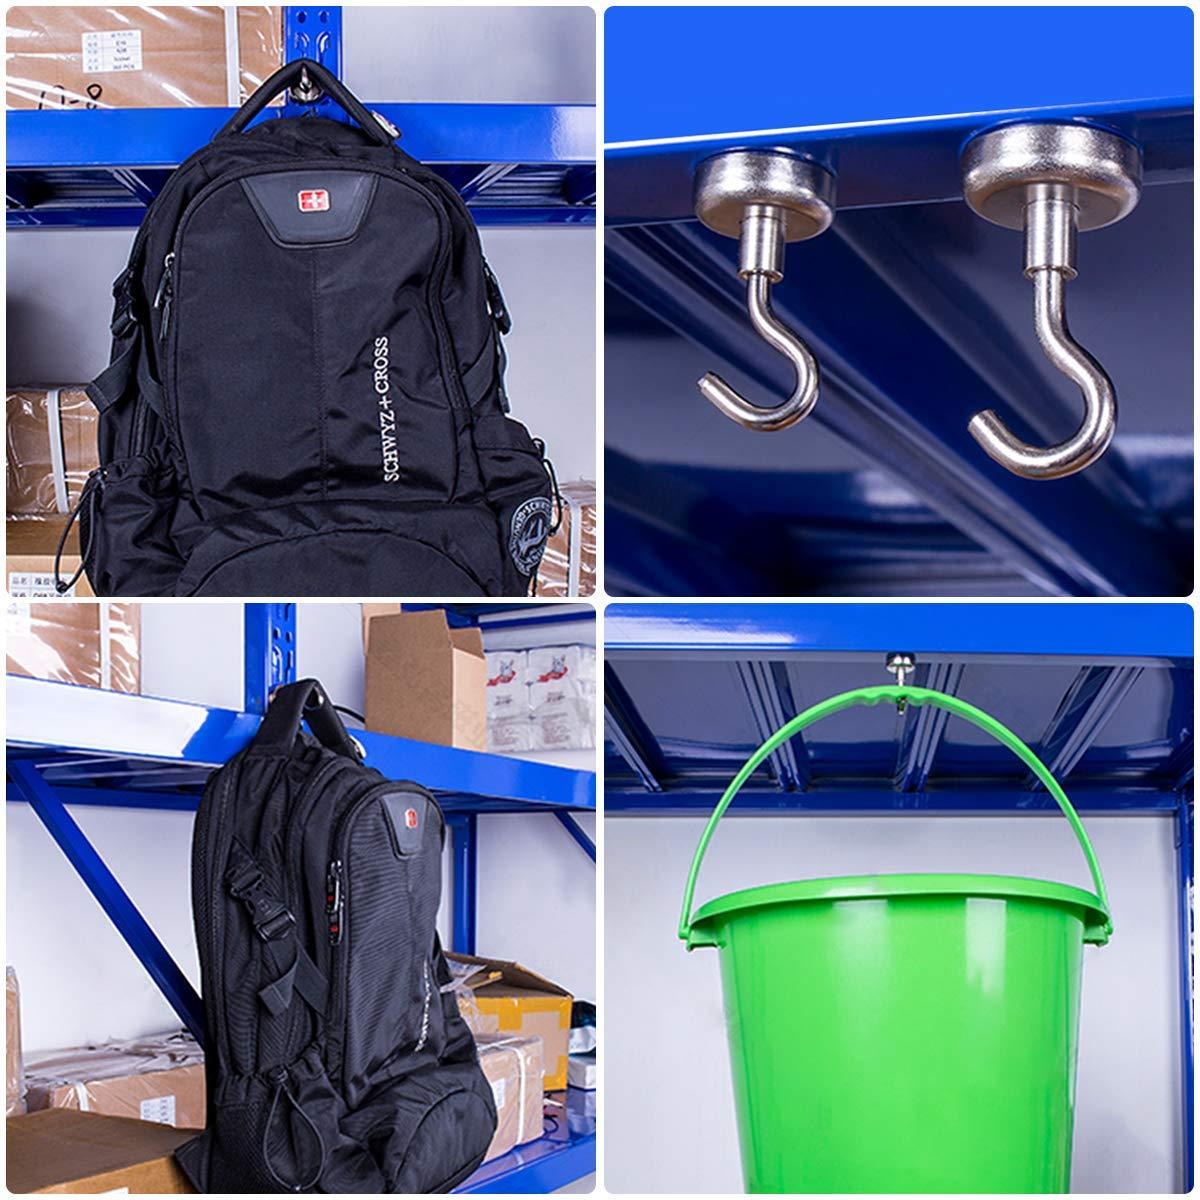 Makone 40 Pound Heavy Duty Neodymium Hanging Mighty Magnetic Hooks D25 10 Packs Magnetic Hooks